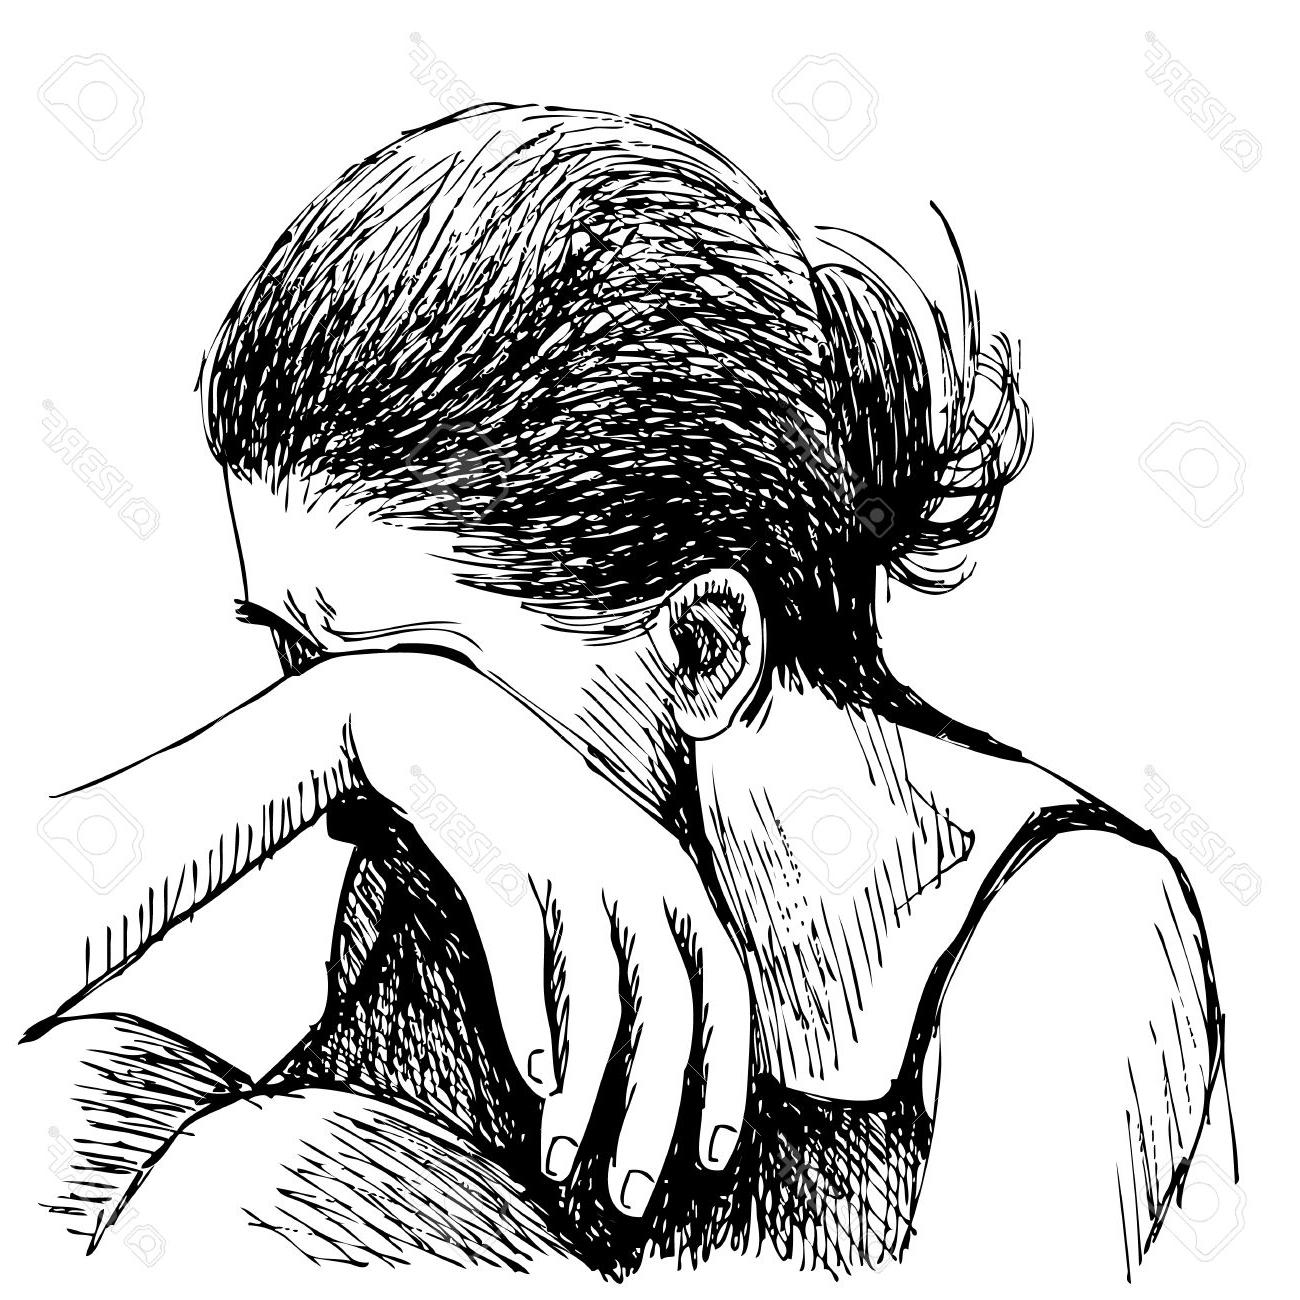 1300x1300 Drawing Sad Girl By White And Black Human Emotion Sketch, Sad Girl